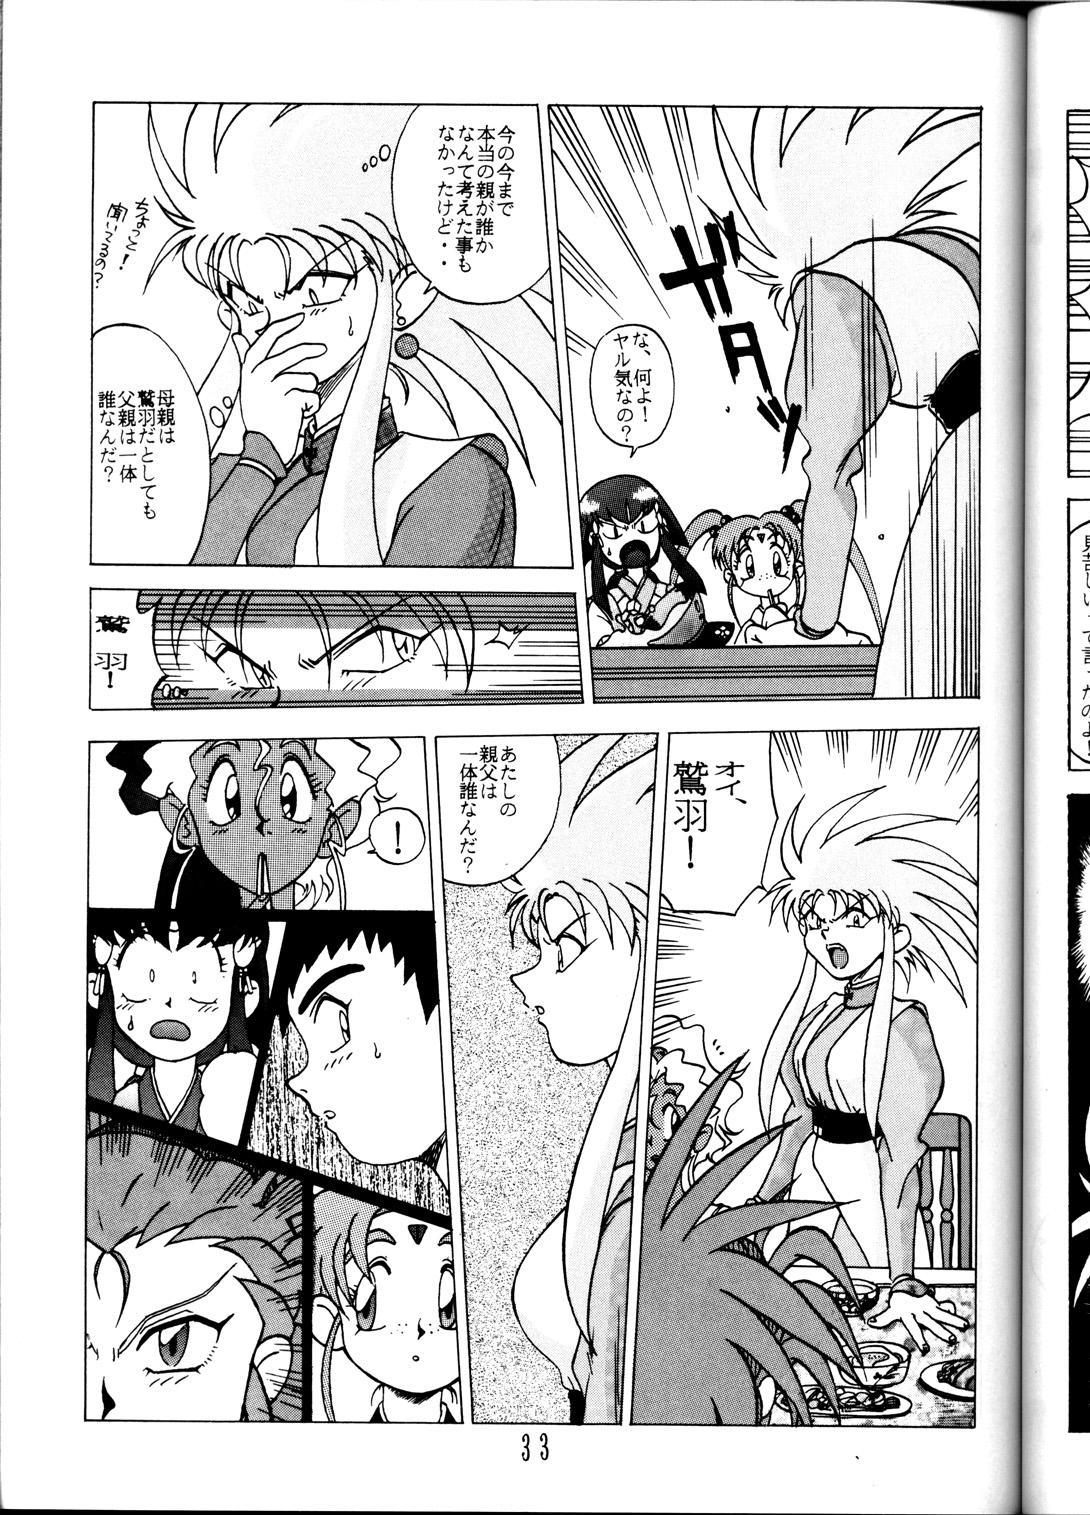 Tenchi Muyou! Sample Vol 6 31